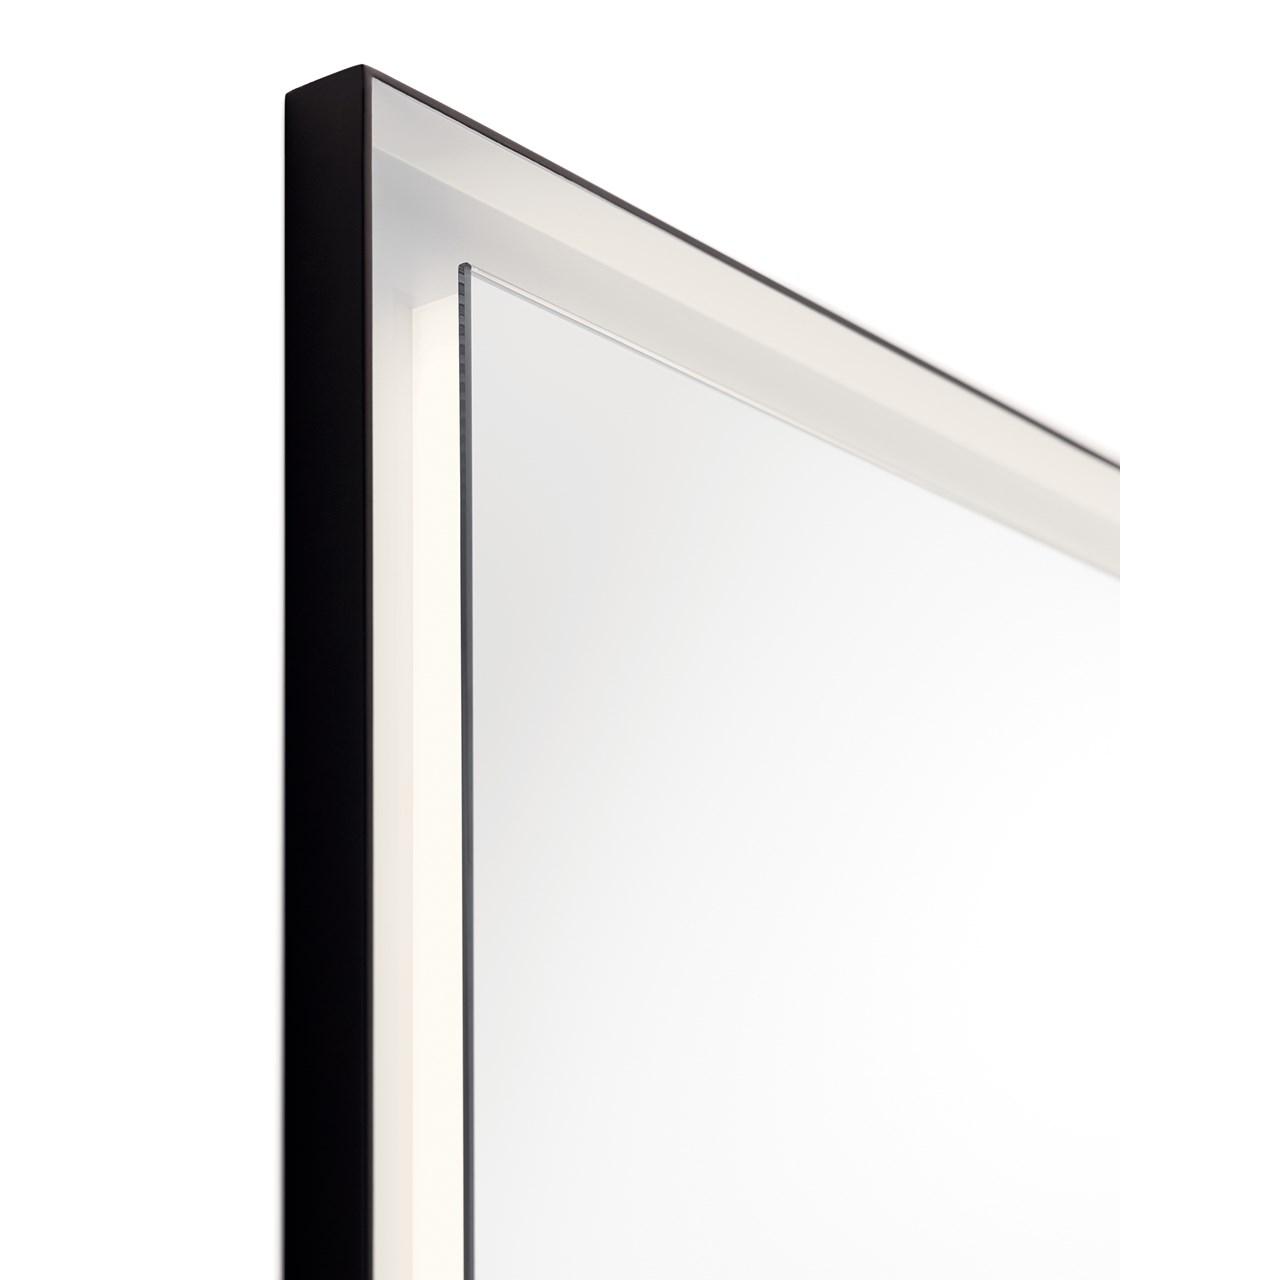 Ryame 24 Quot Lighted Mirror Black Kichler Lighting